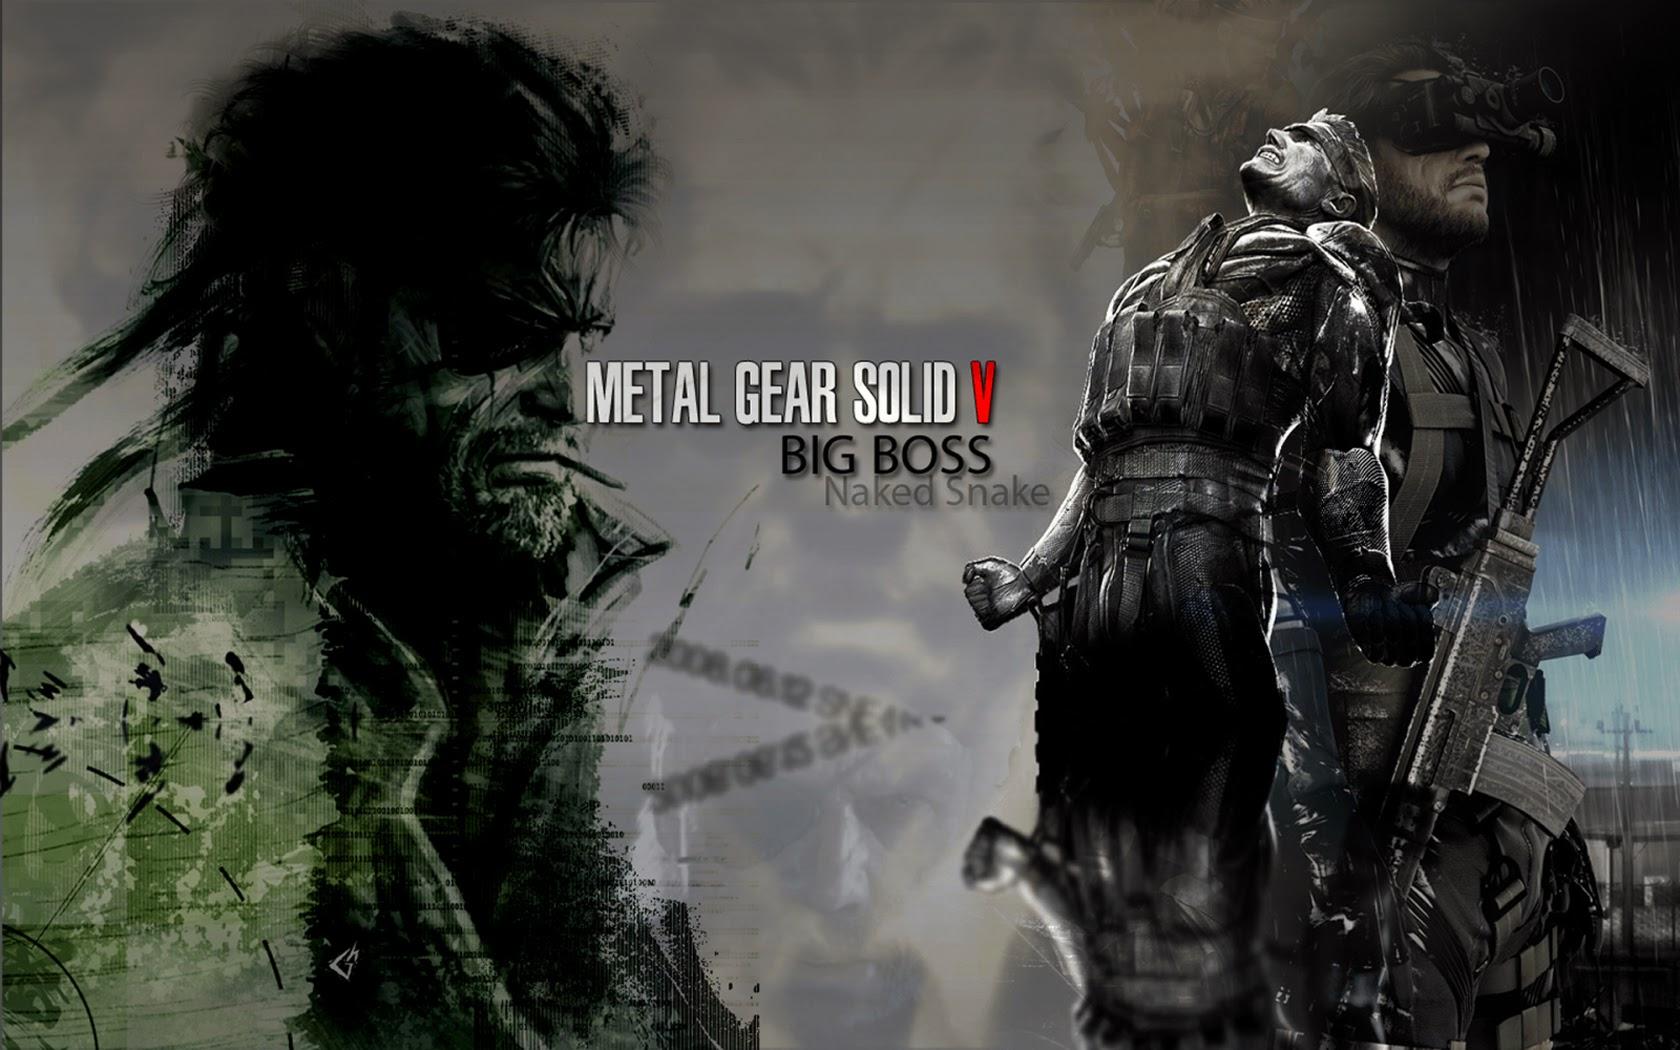 Free Download Solid V 5 The Phantom Pain Big Boss Naked Snake